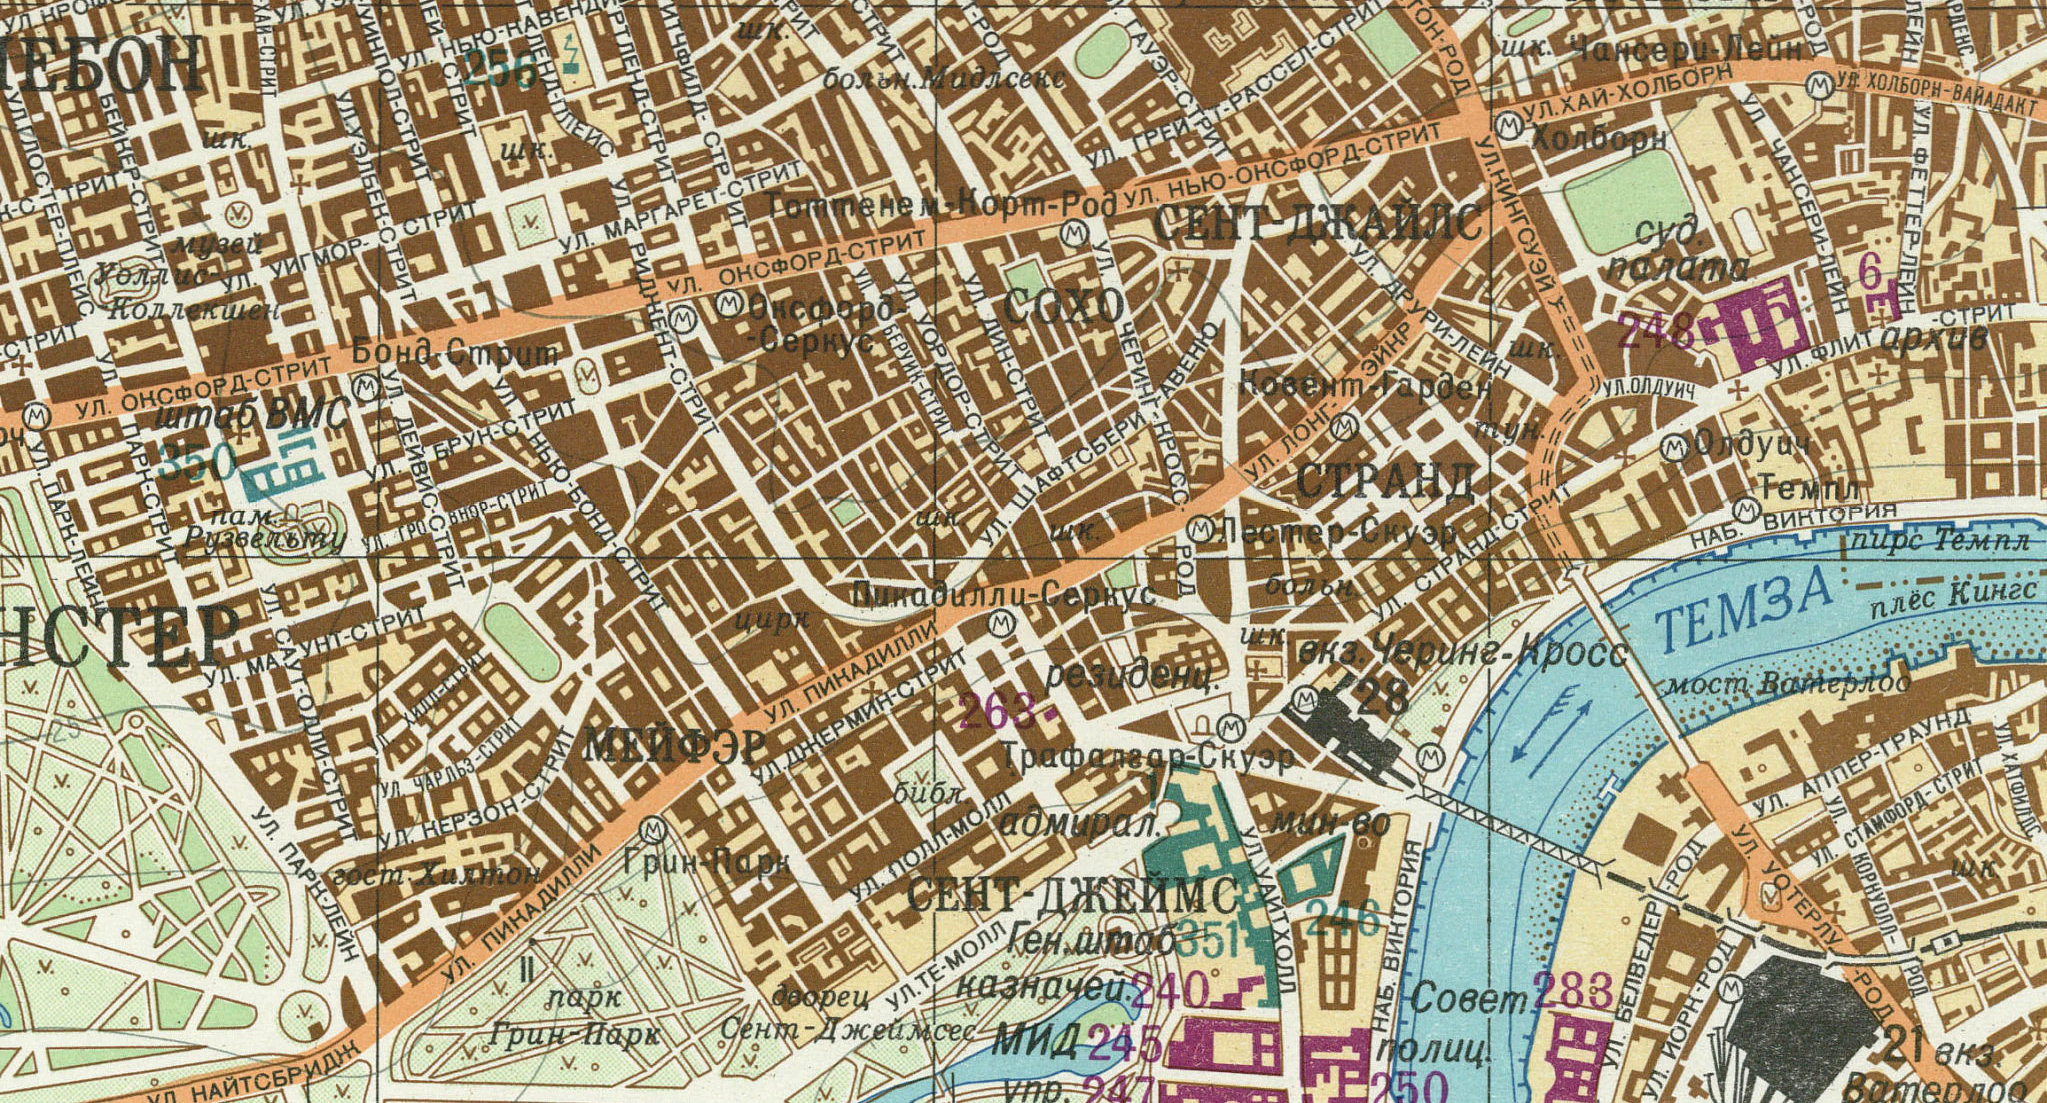 Mapa soviético de Londres